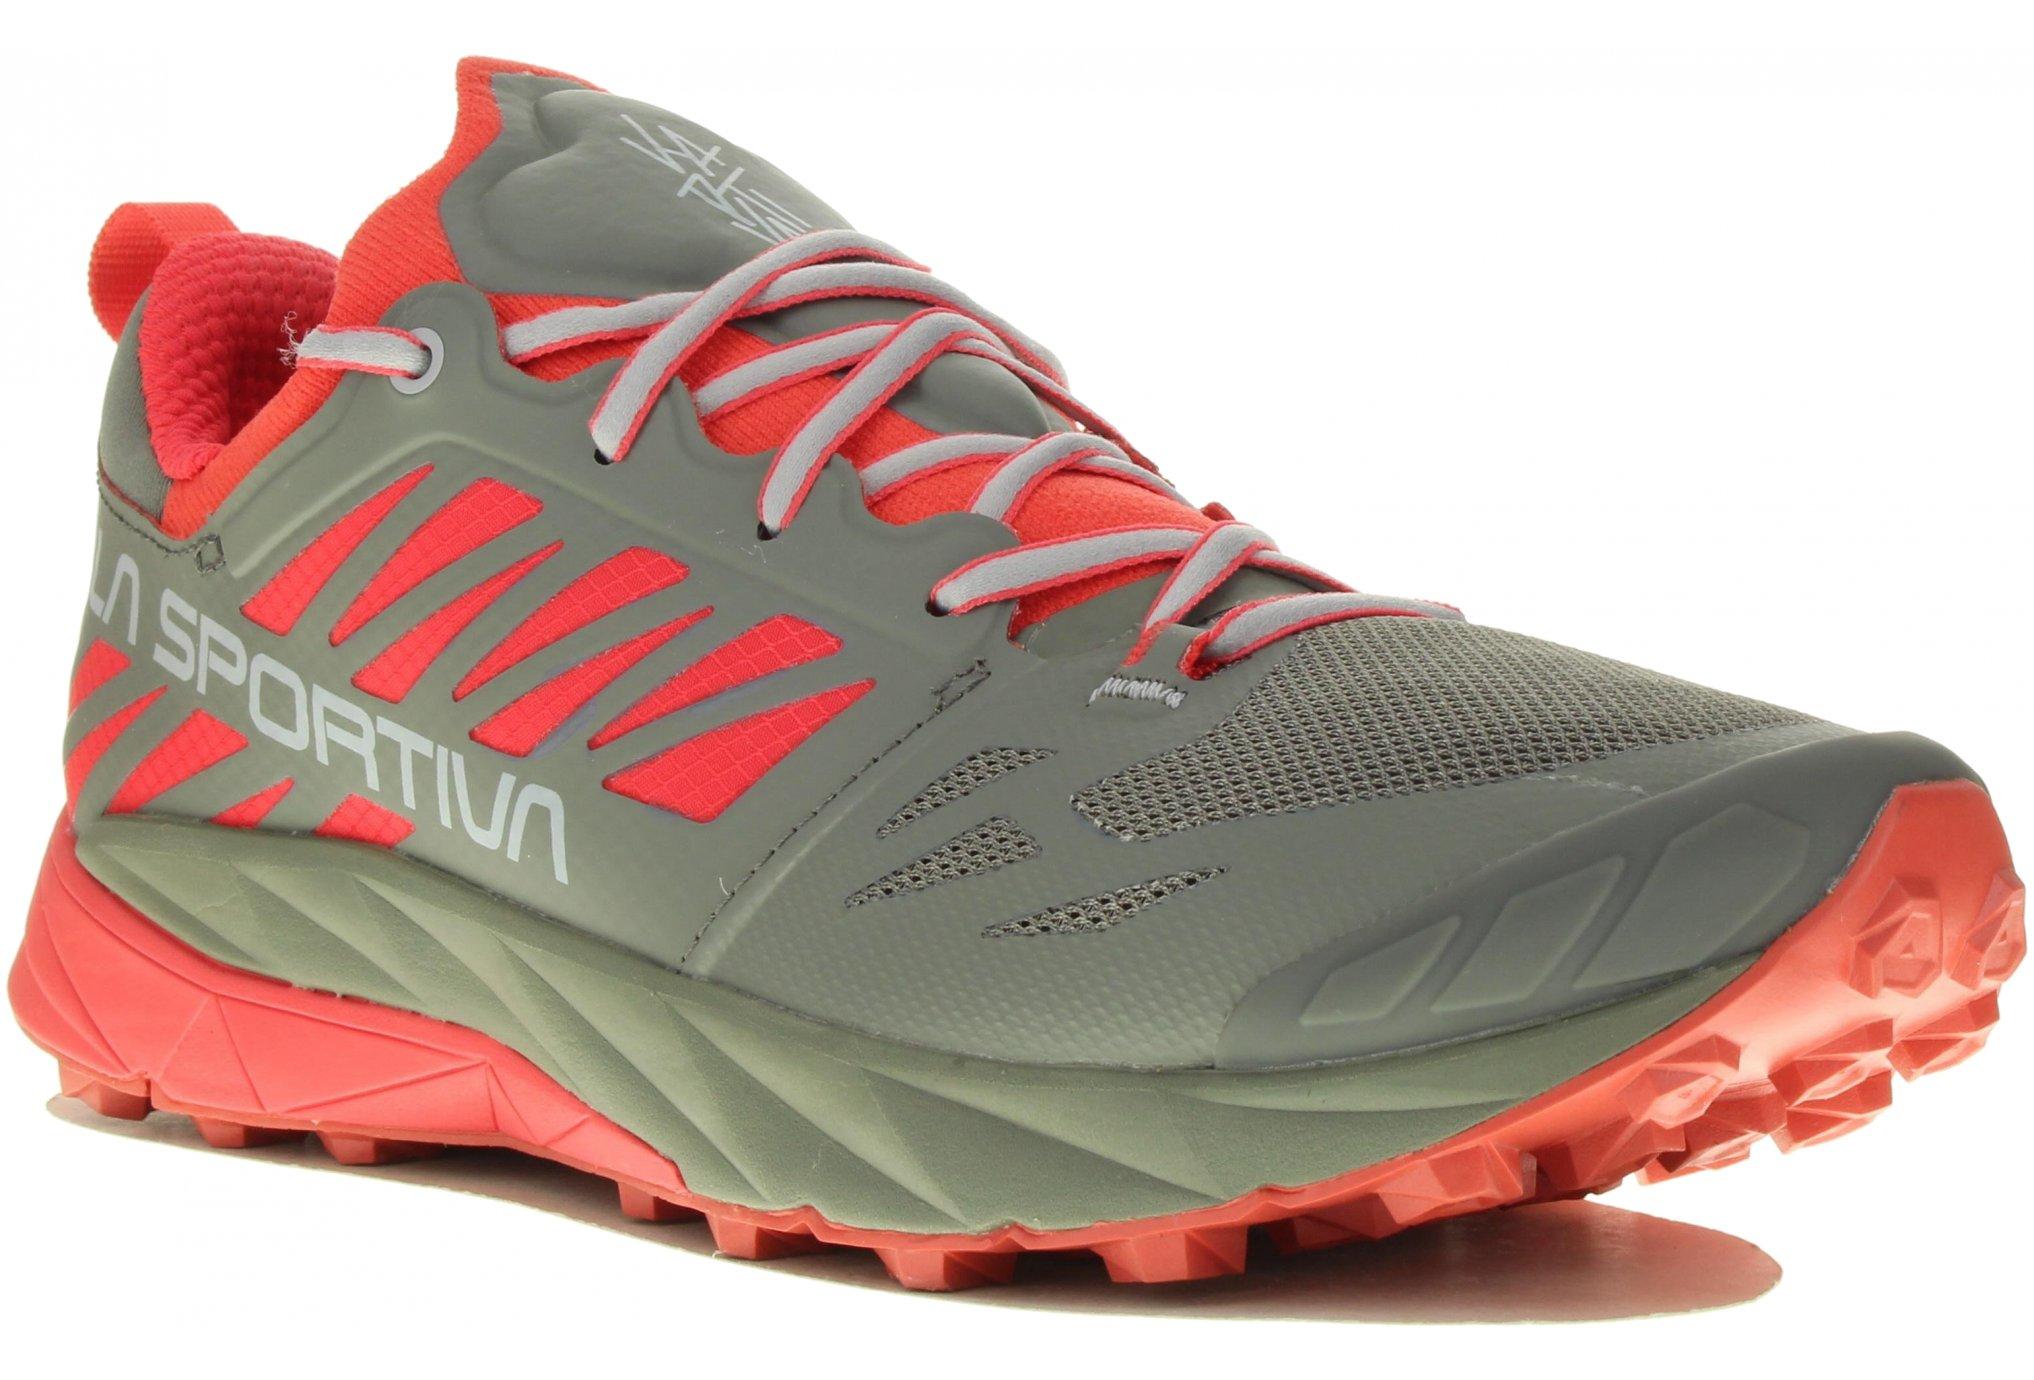 La Sportiva Kaptiva Chaussures running femme